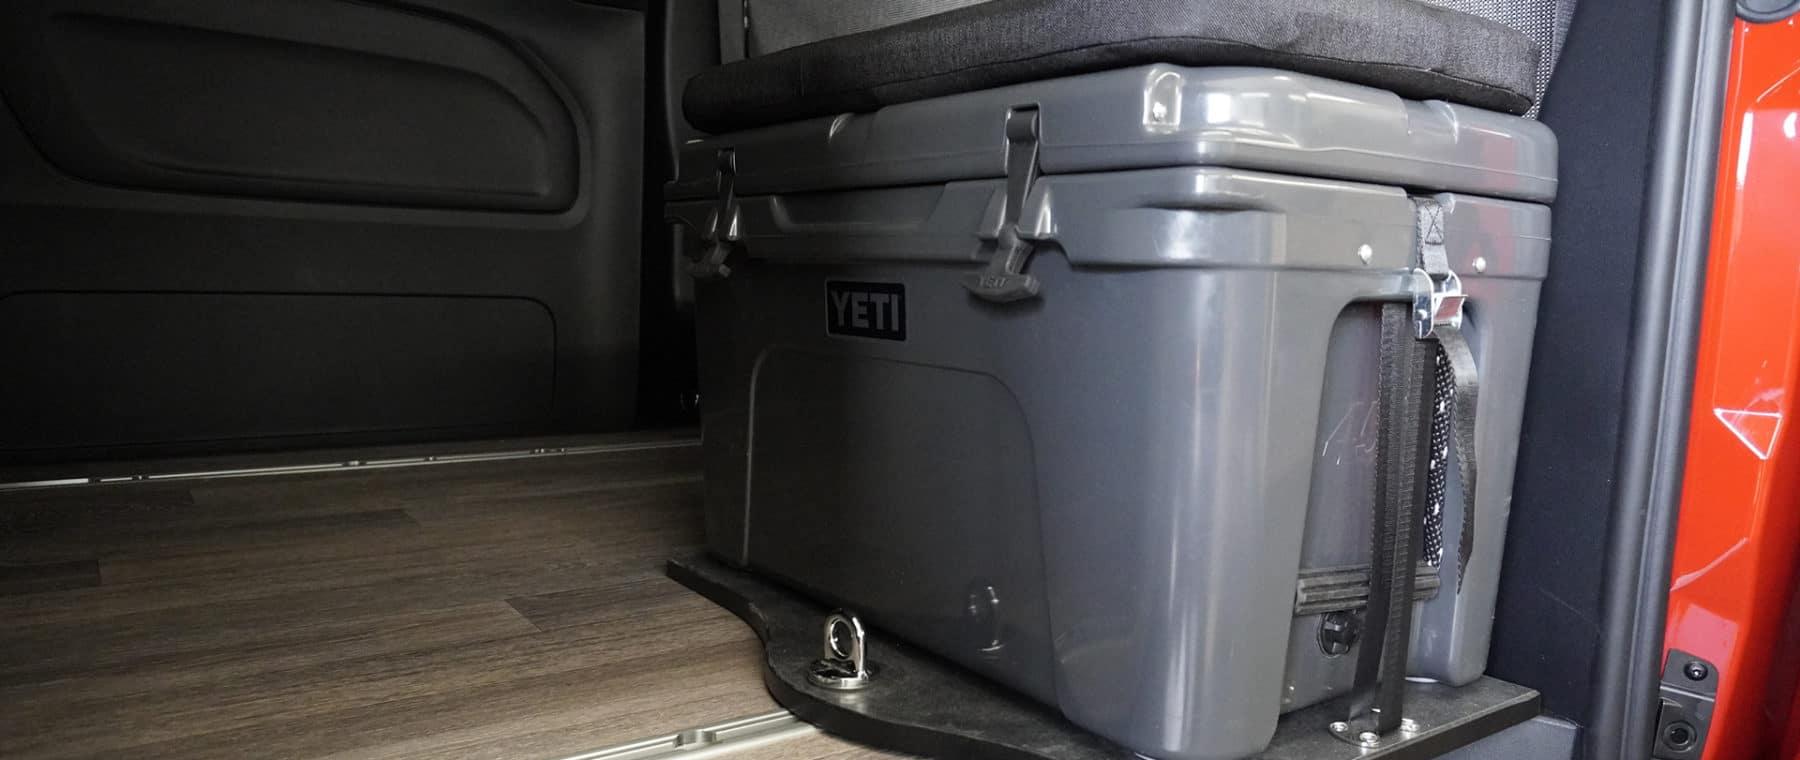 YETI BOX – SECURED FRONT